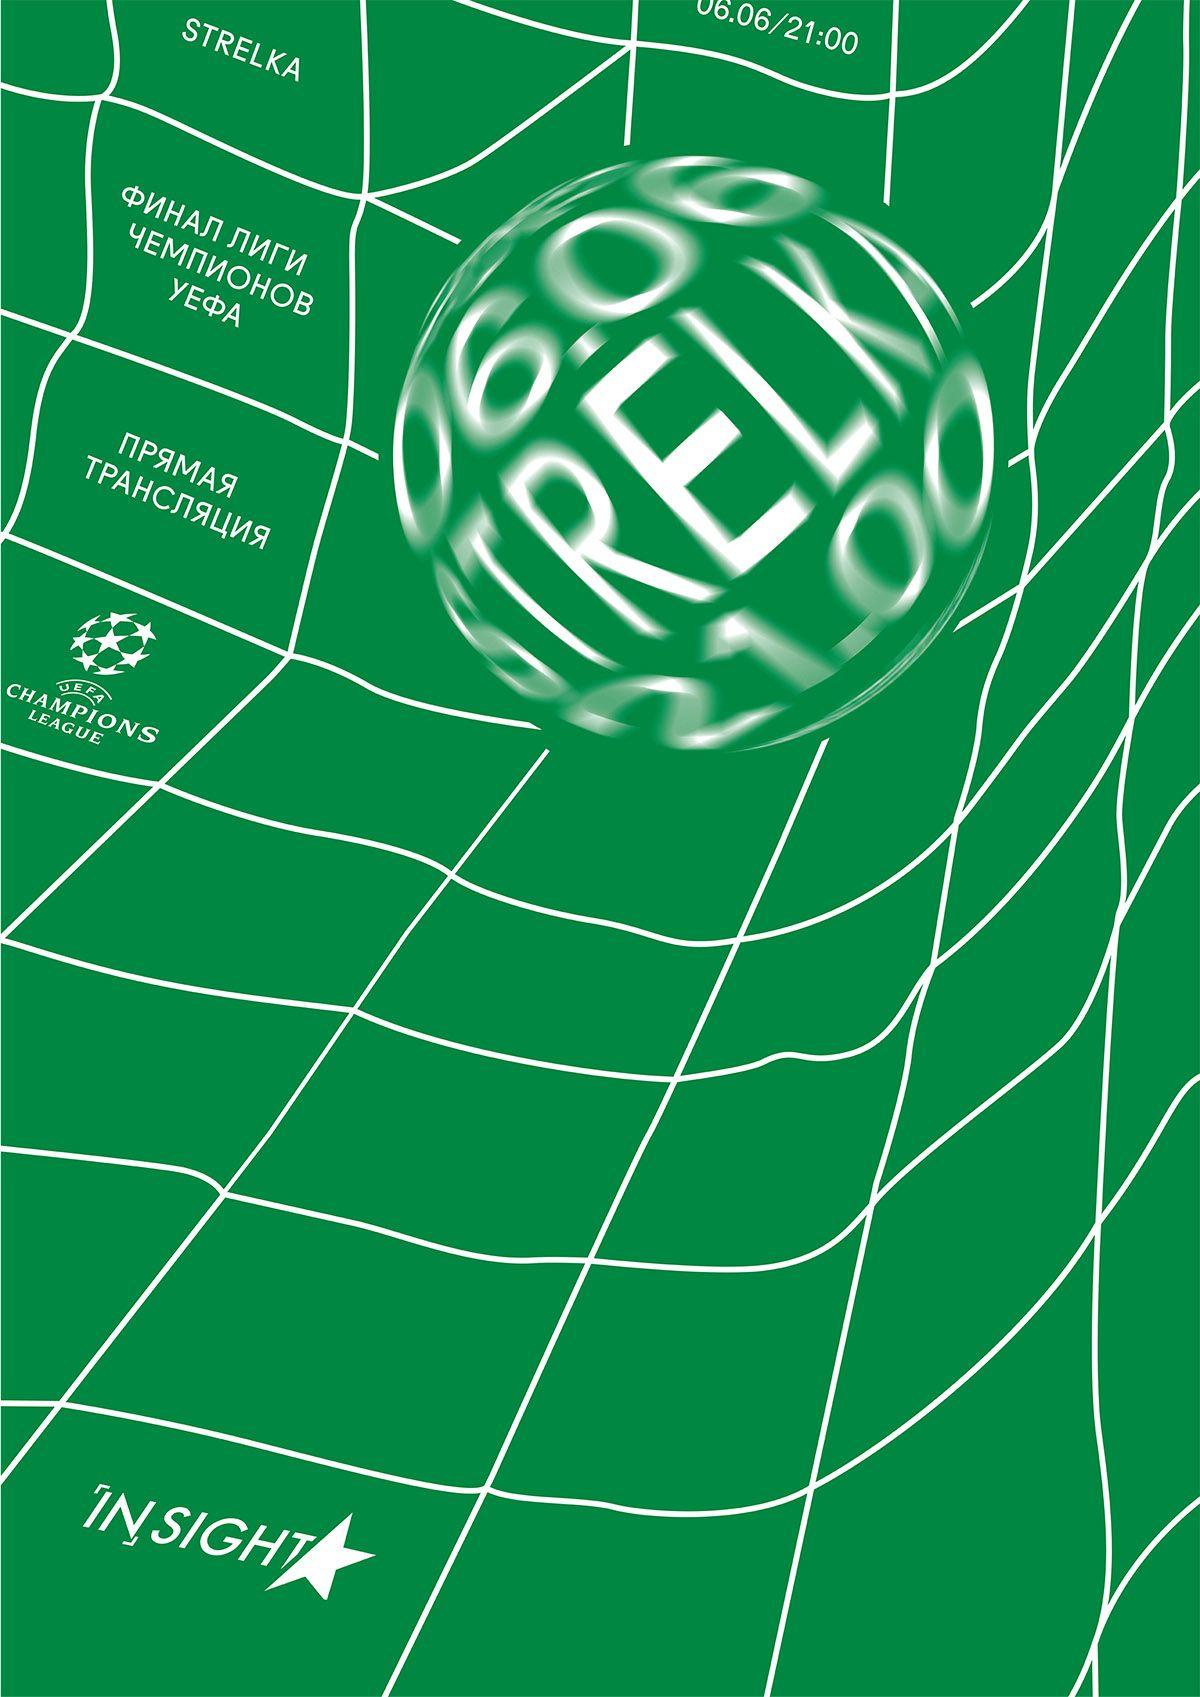 UEFA Champions League at Strelka Institute - Kulac